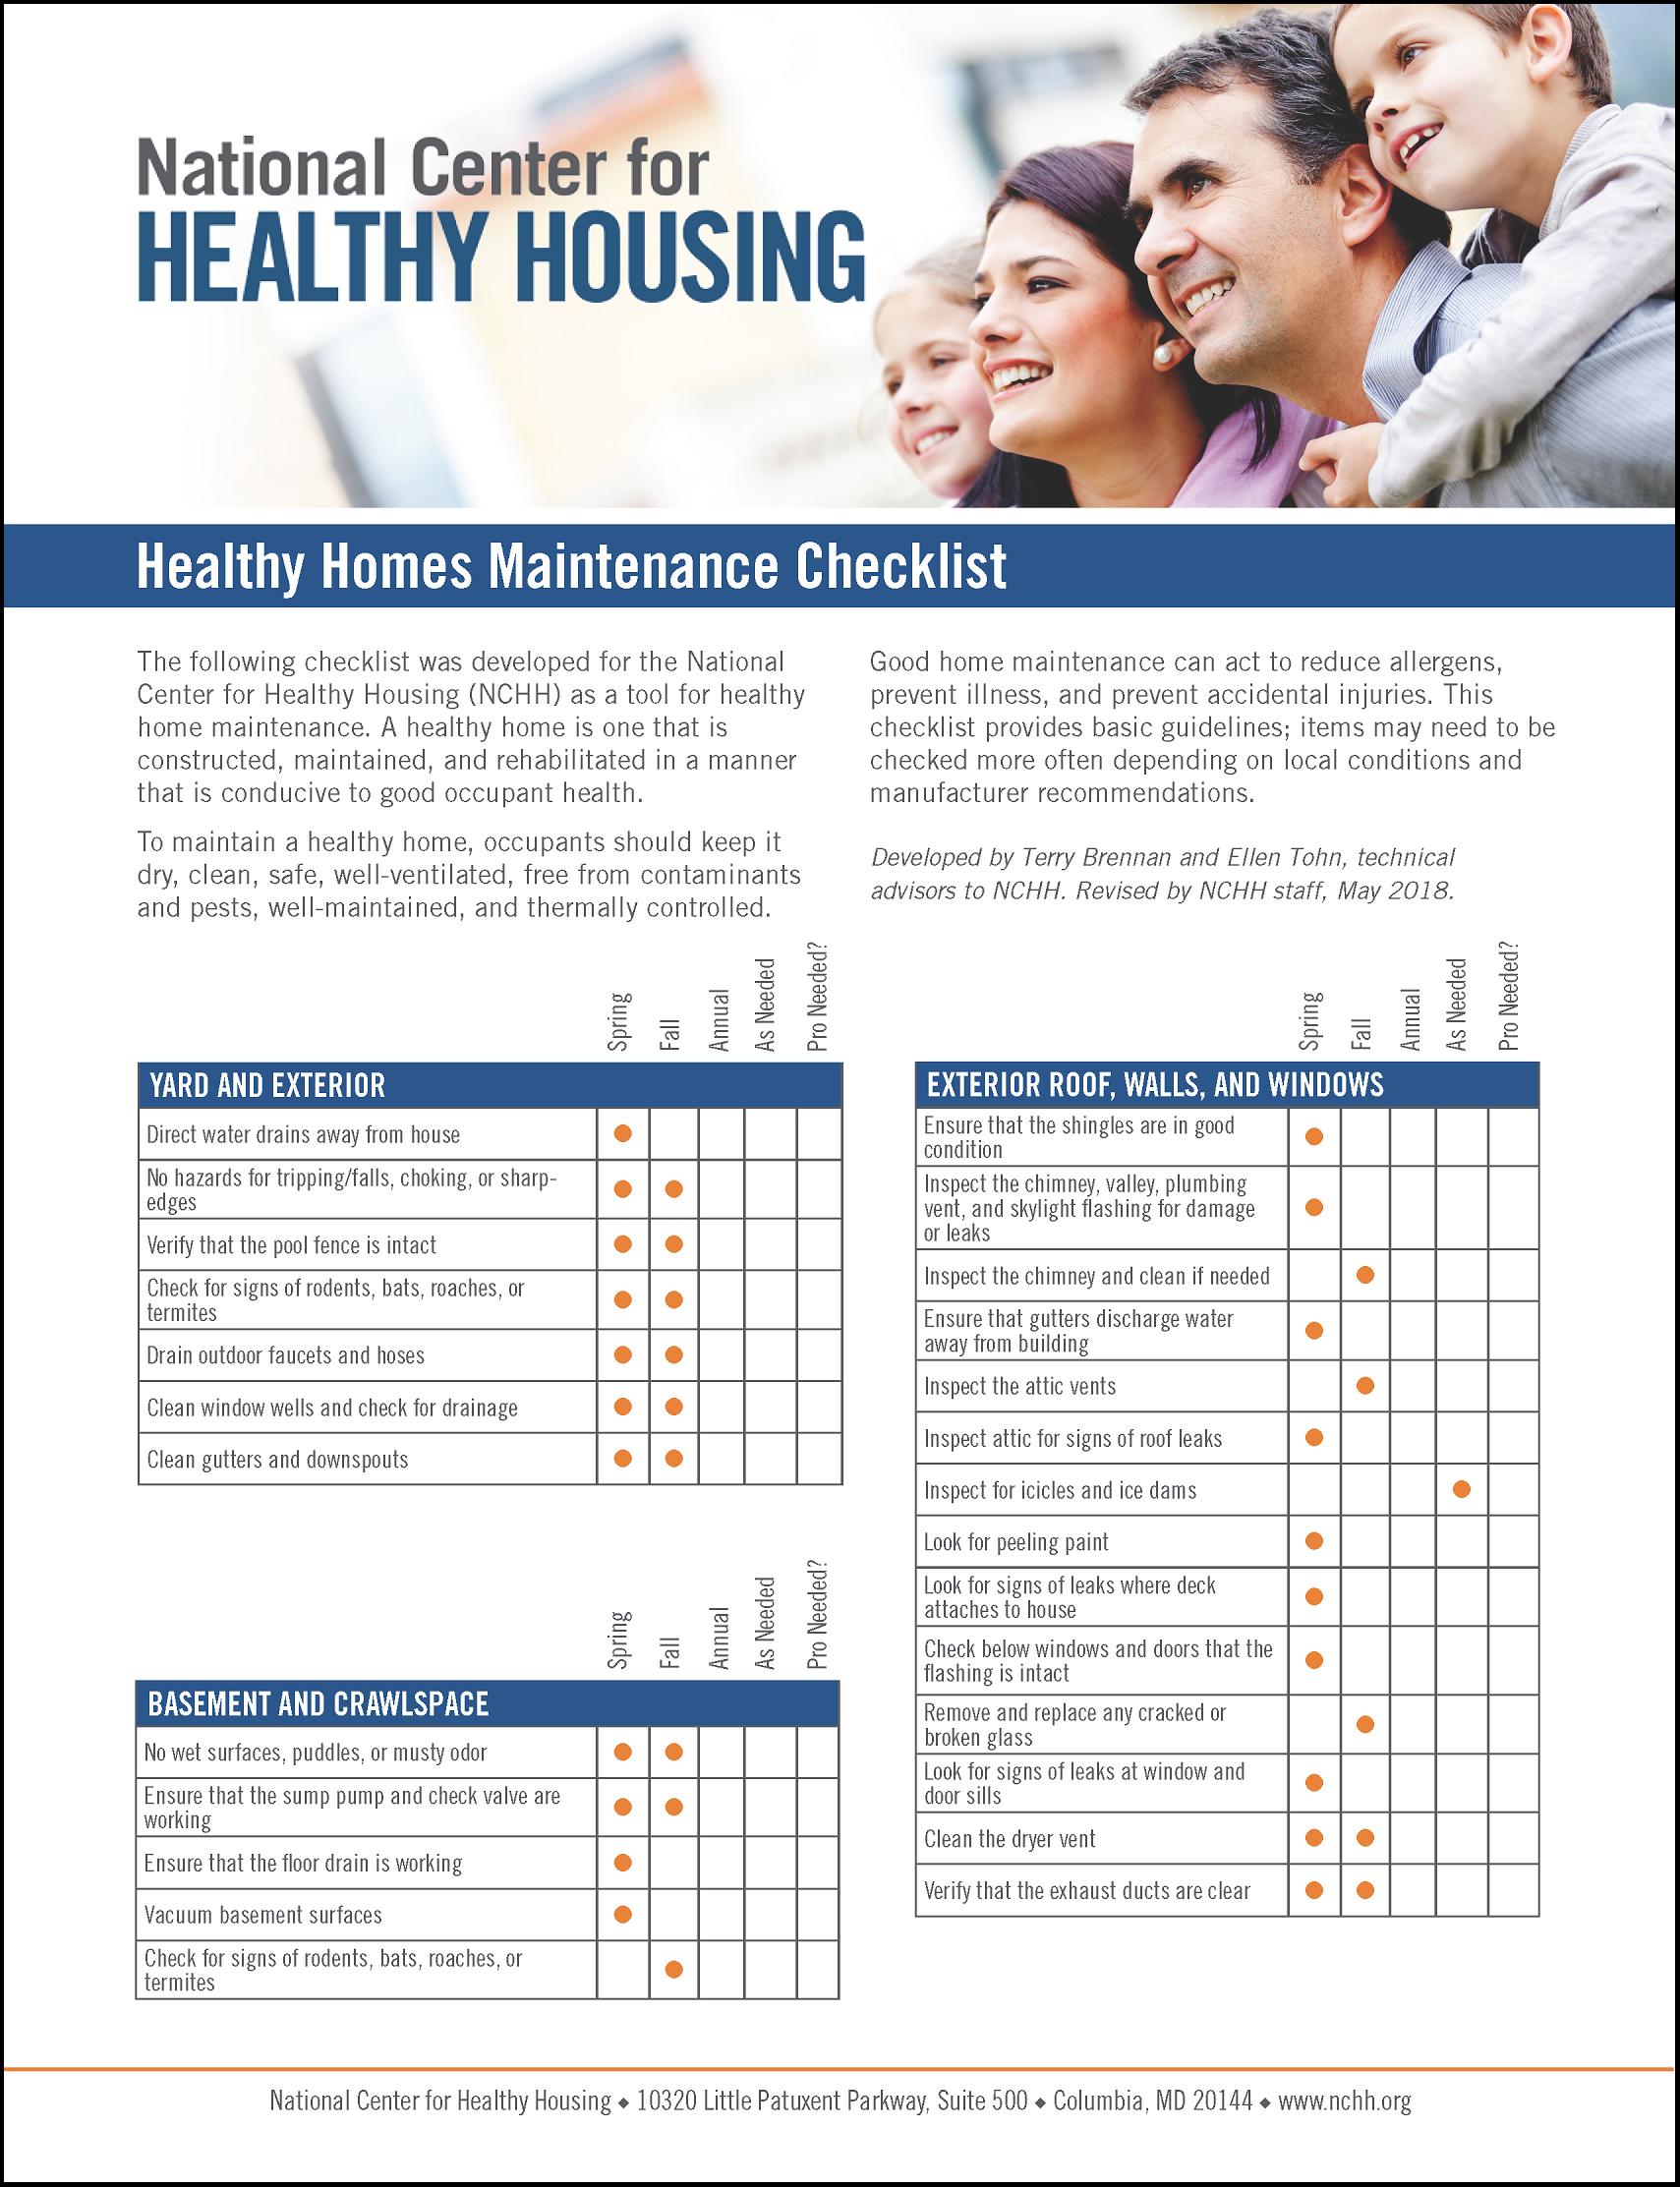 Healthy Homes Maintenance Checklist